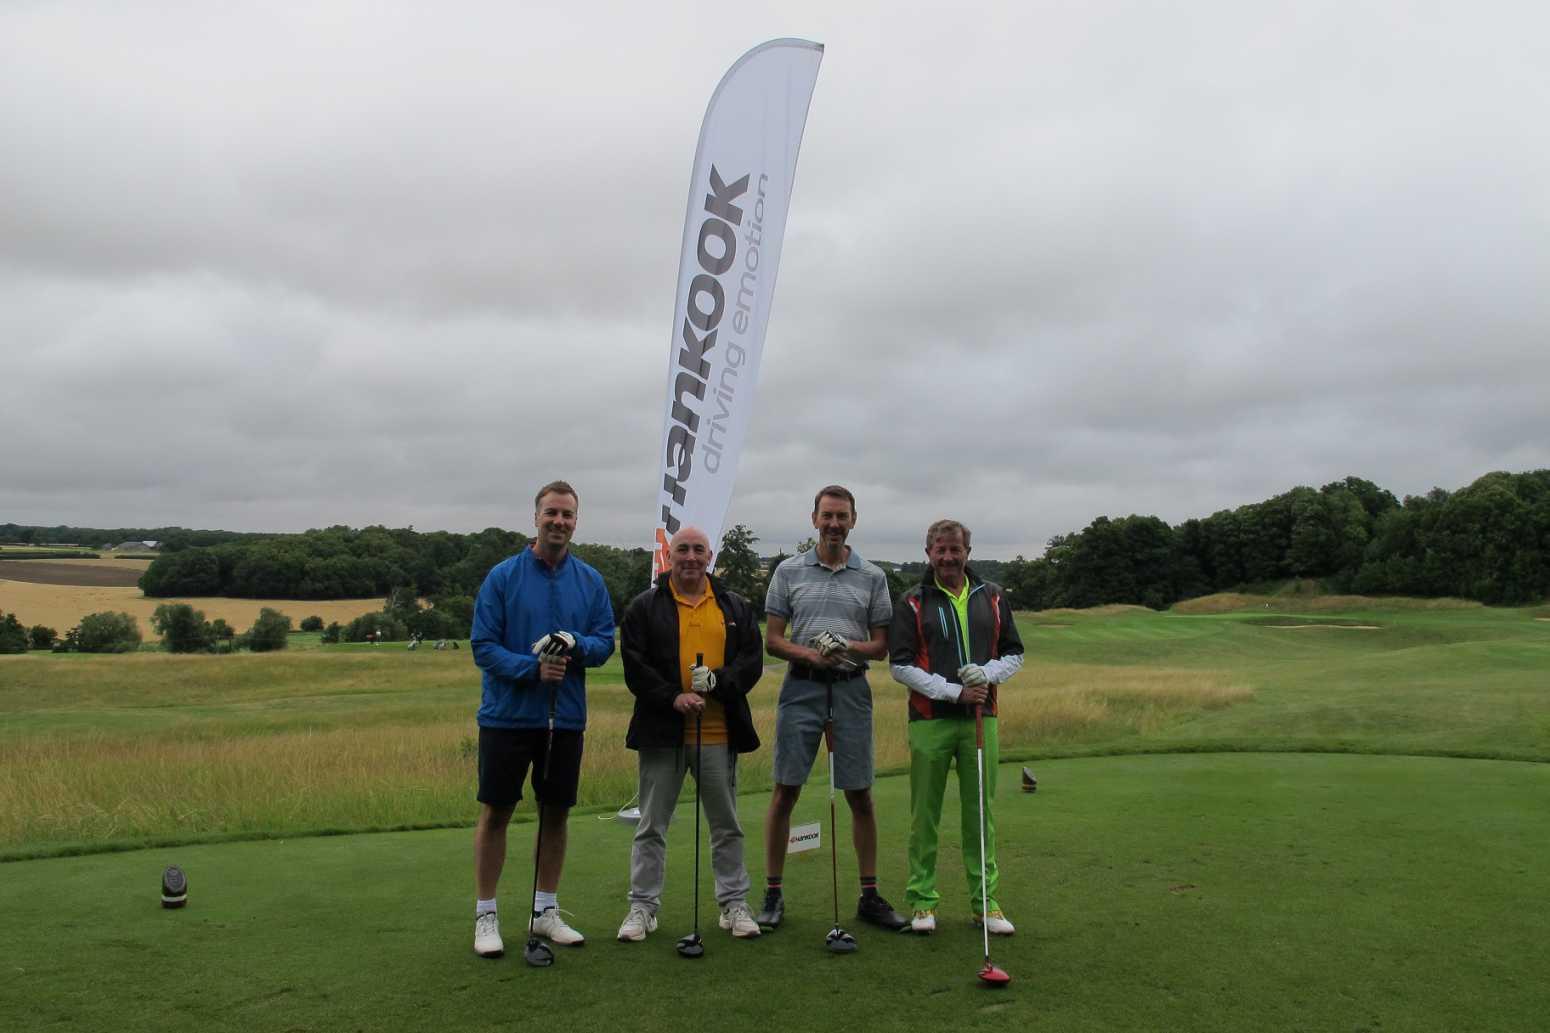 Watling Tyre's Roger Flury at the Hankook Golf Classic